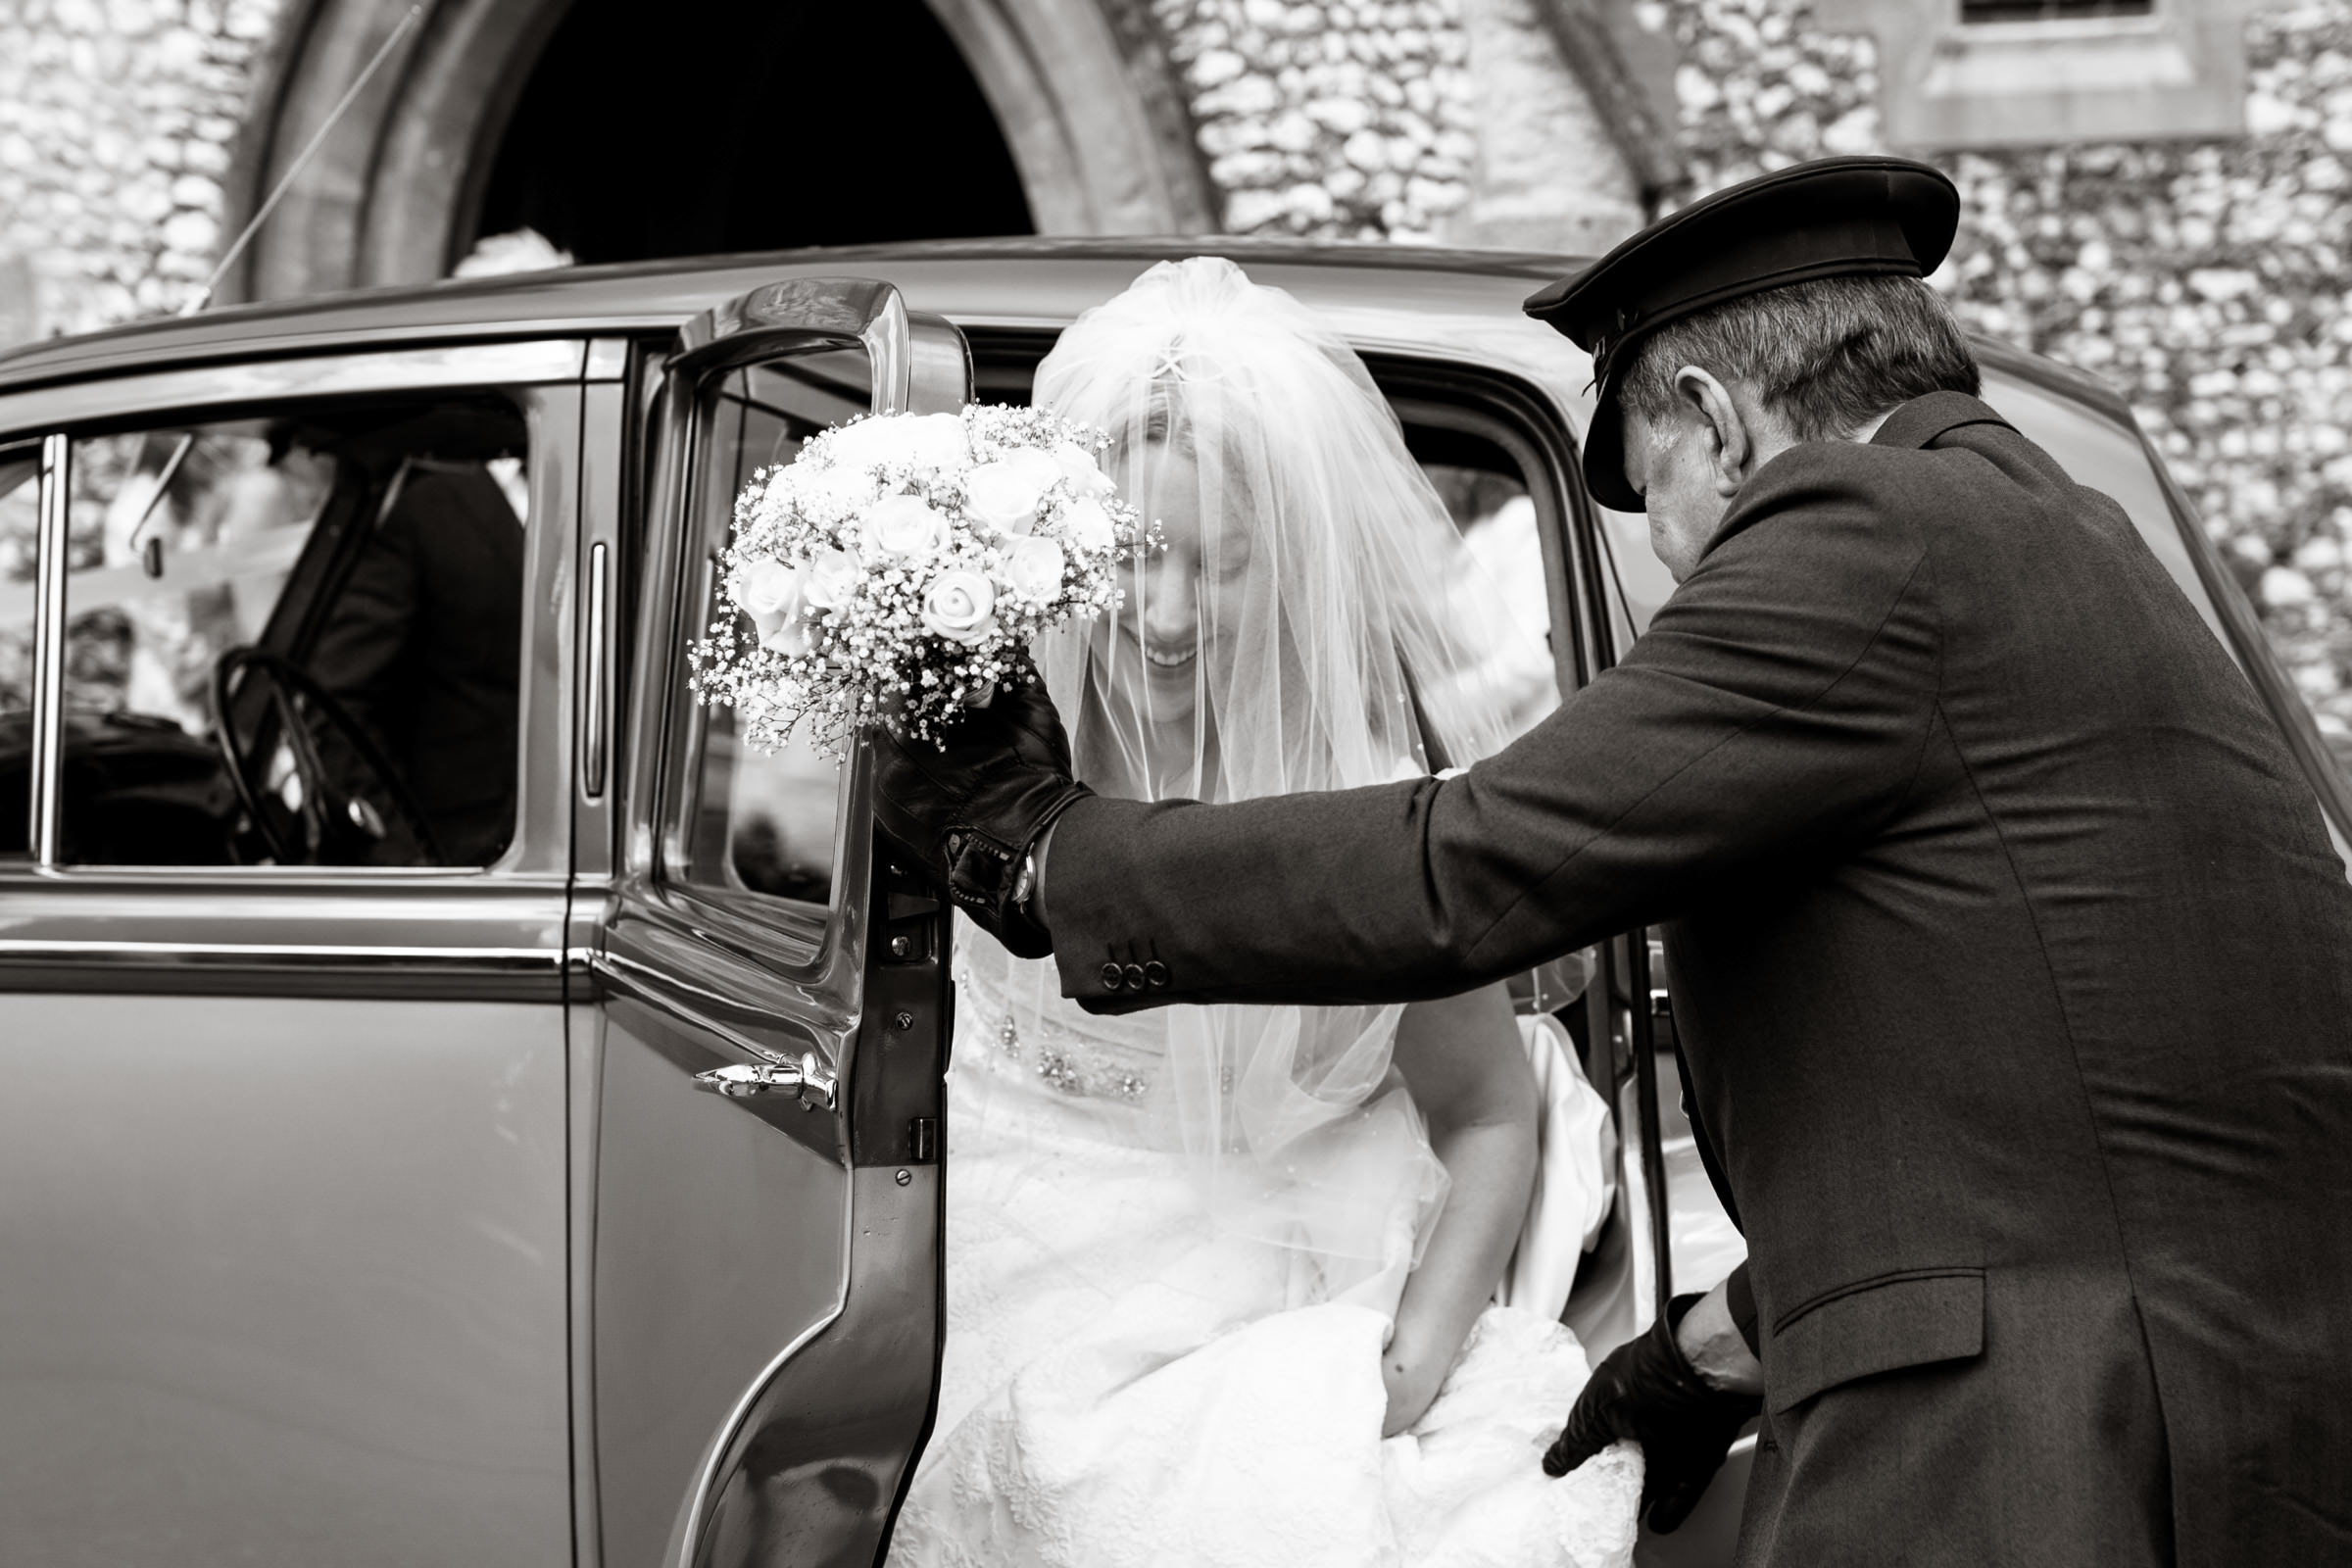 Wedding at Clandon Park in Guildford 005.jpg